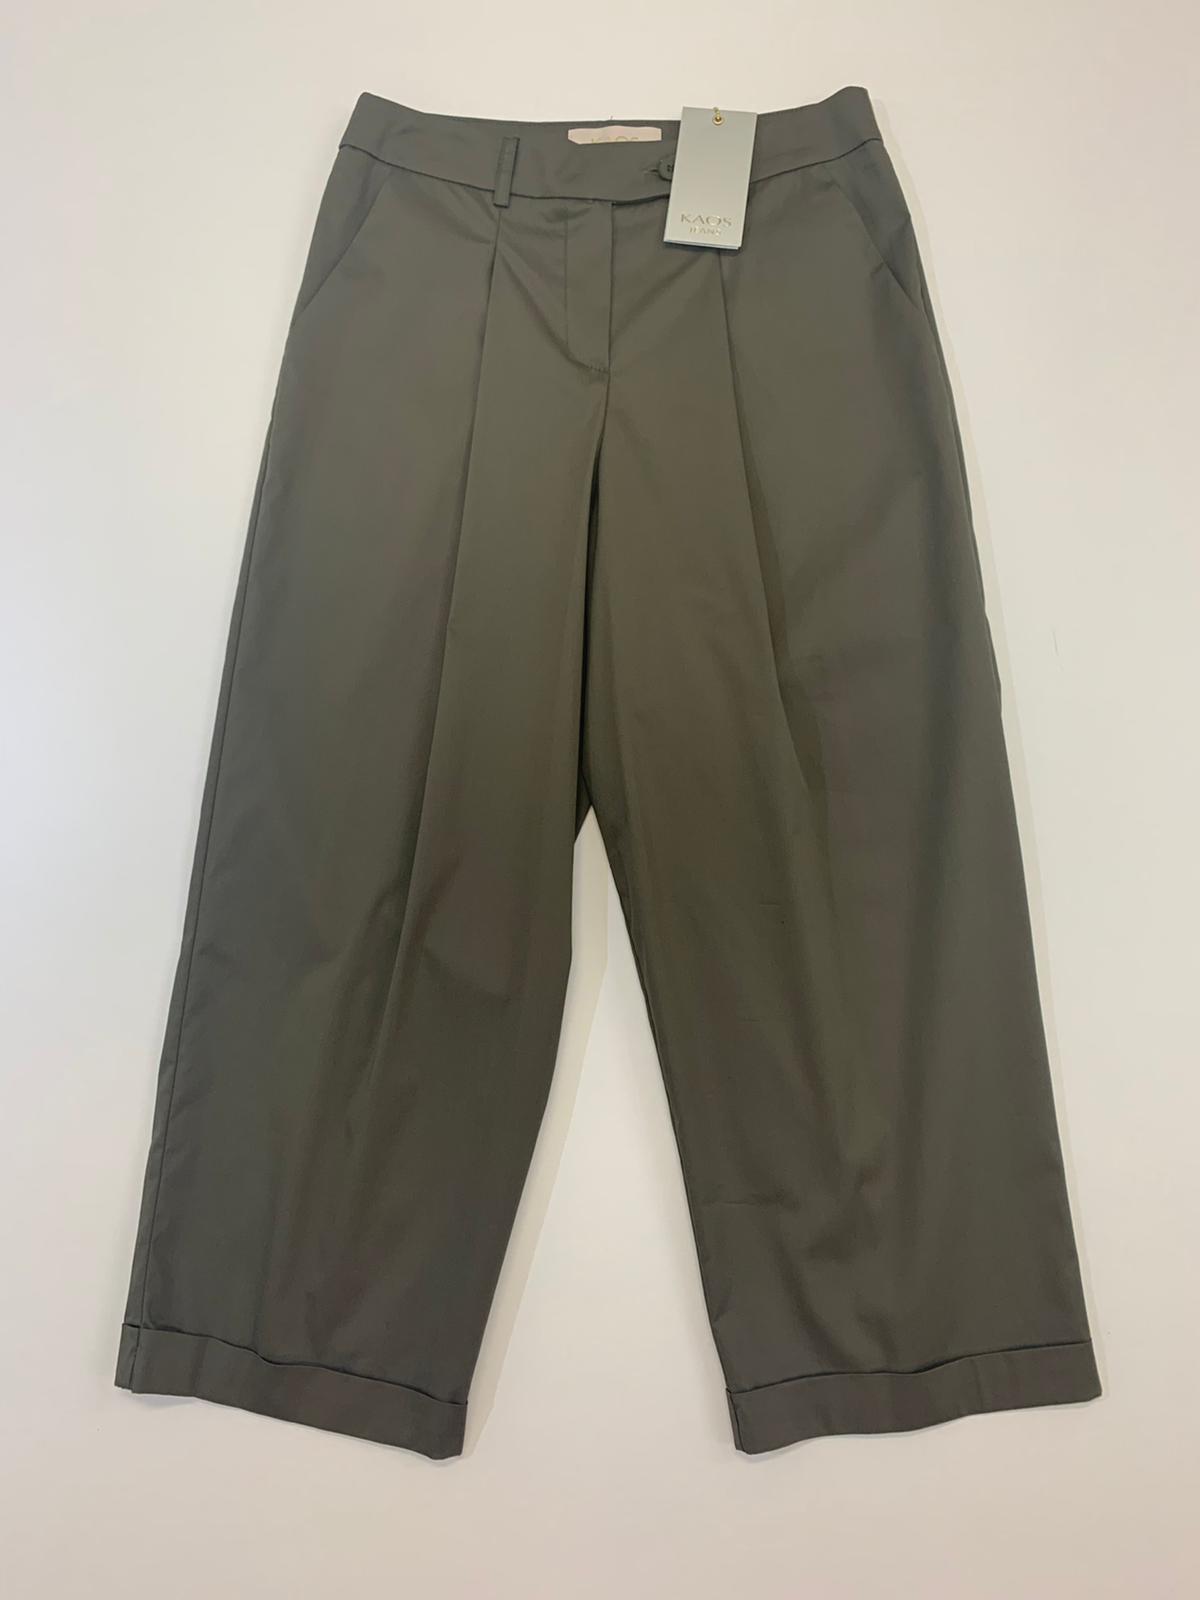 Pantalone Kaos Jeans Croppe Militare